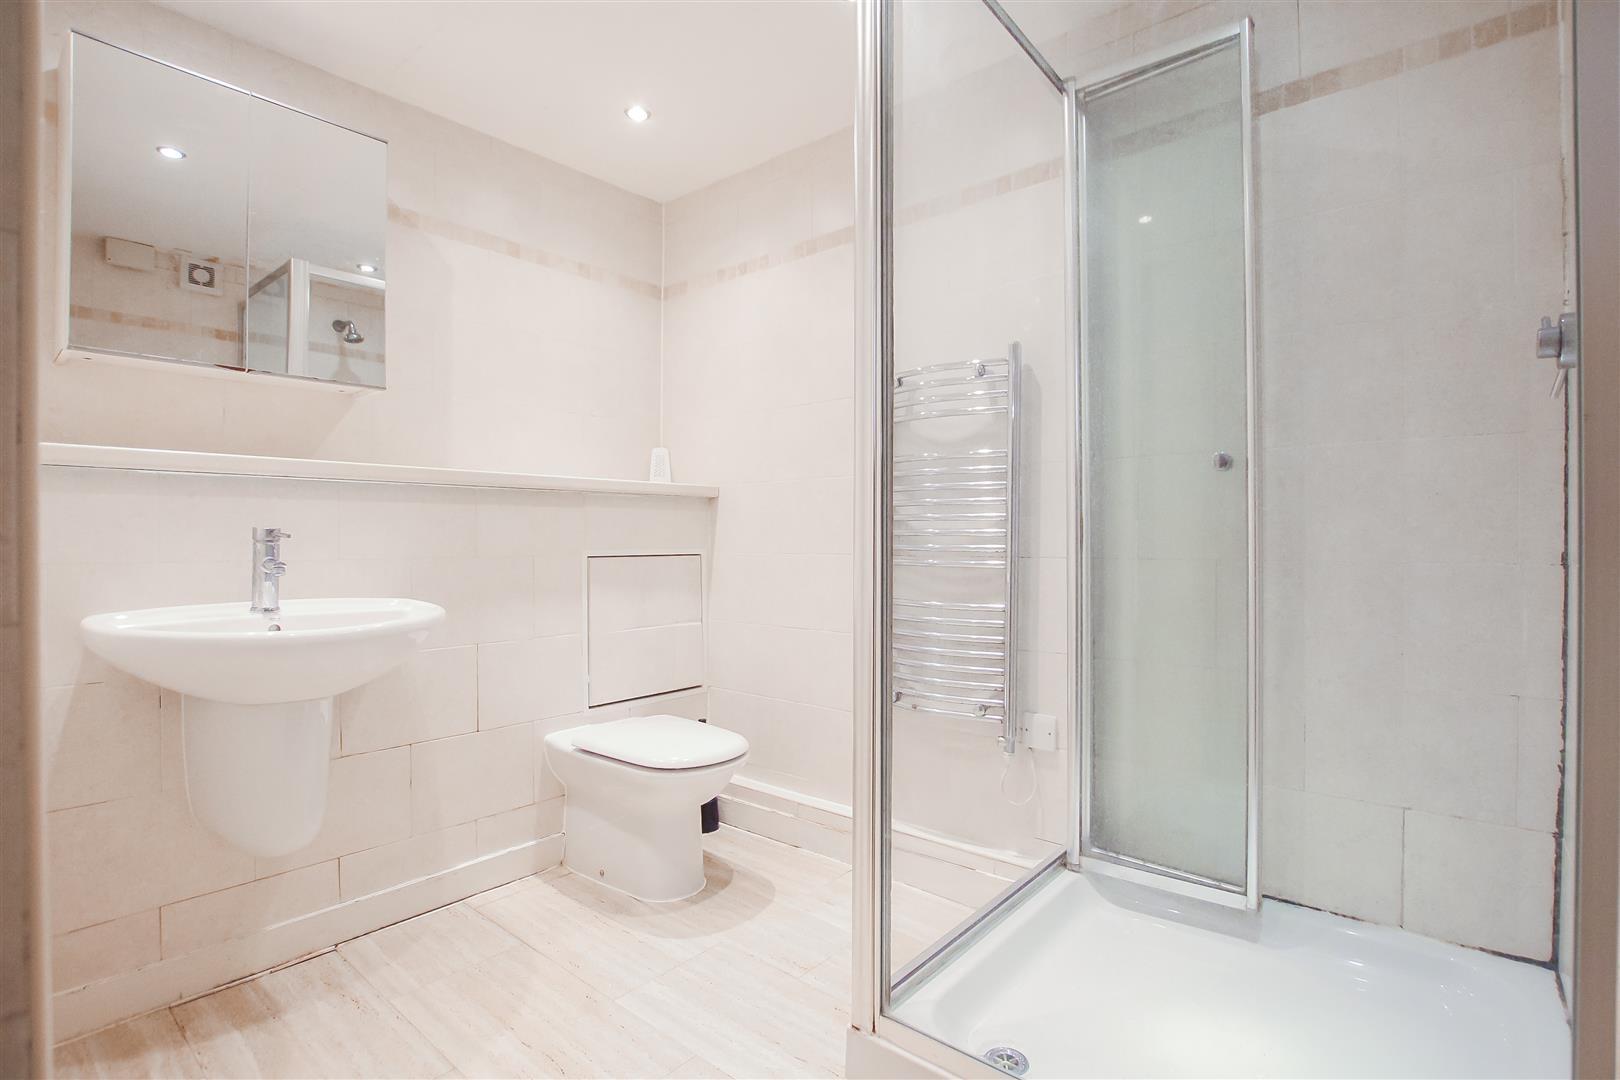 2 Bedroom Apartment For Sale - En-suite